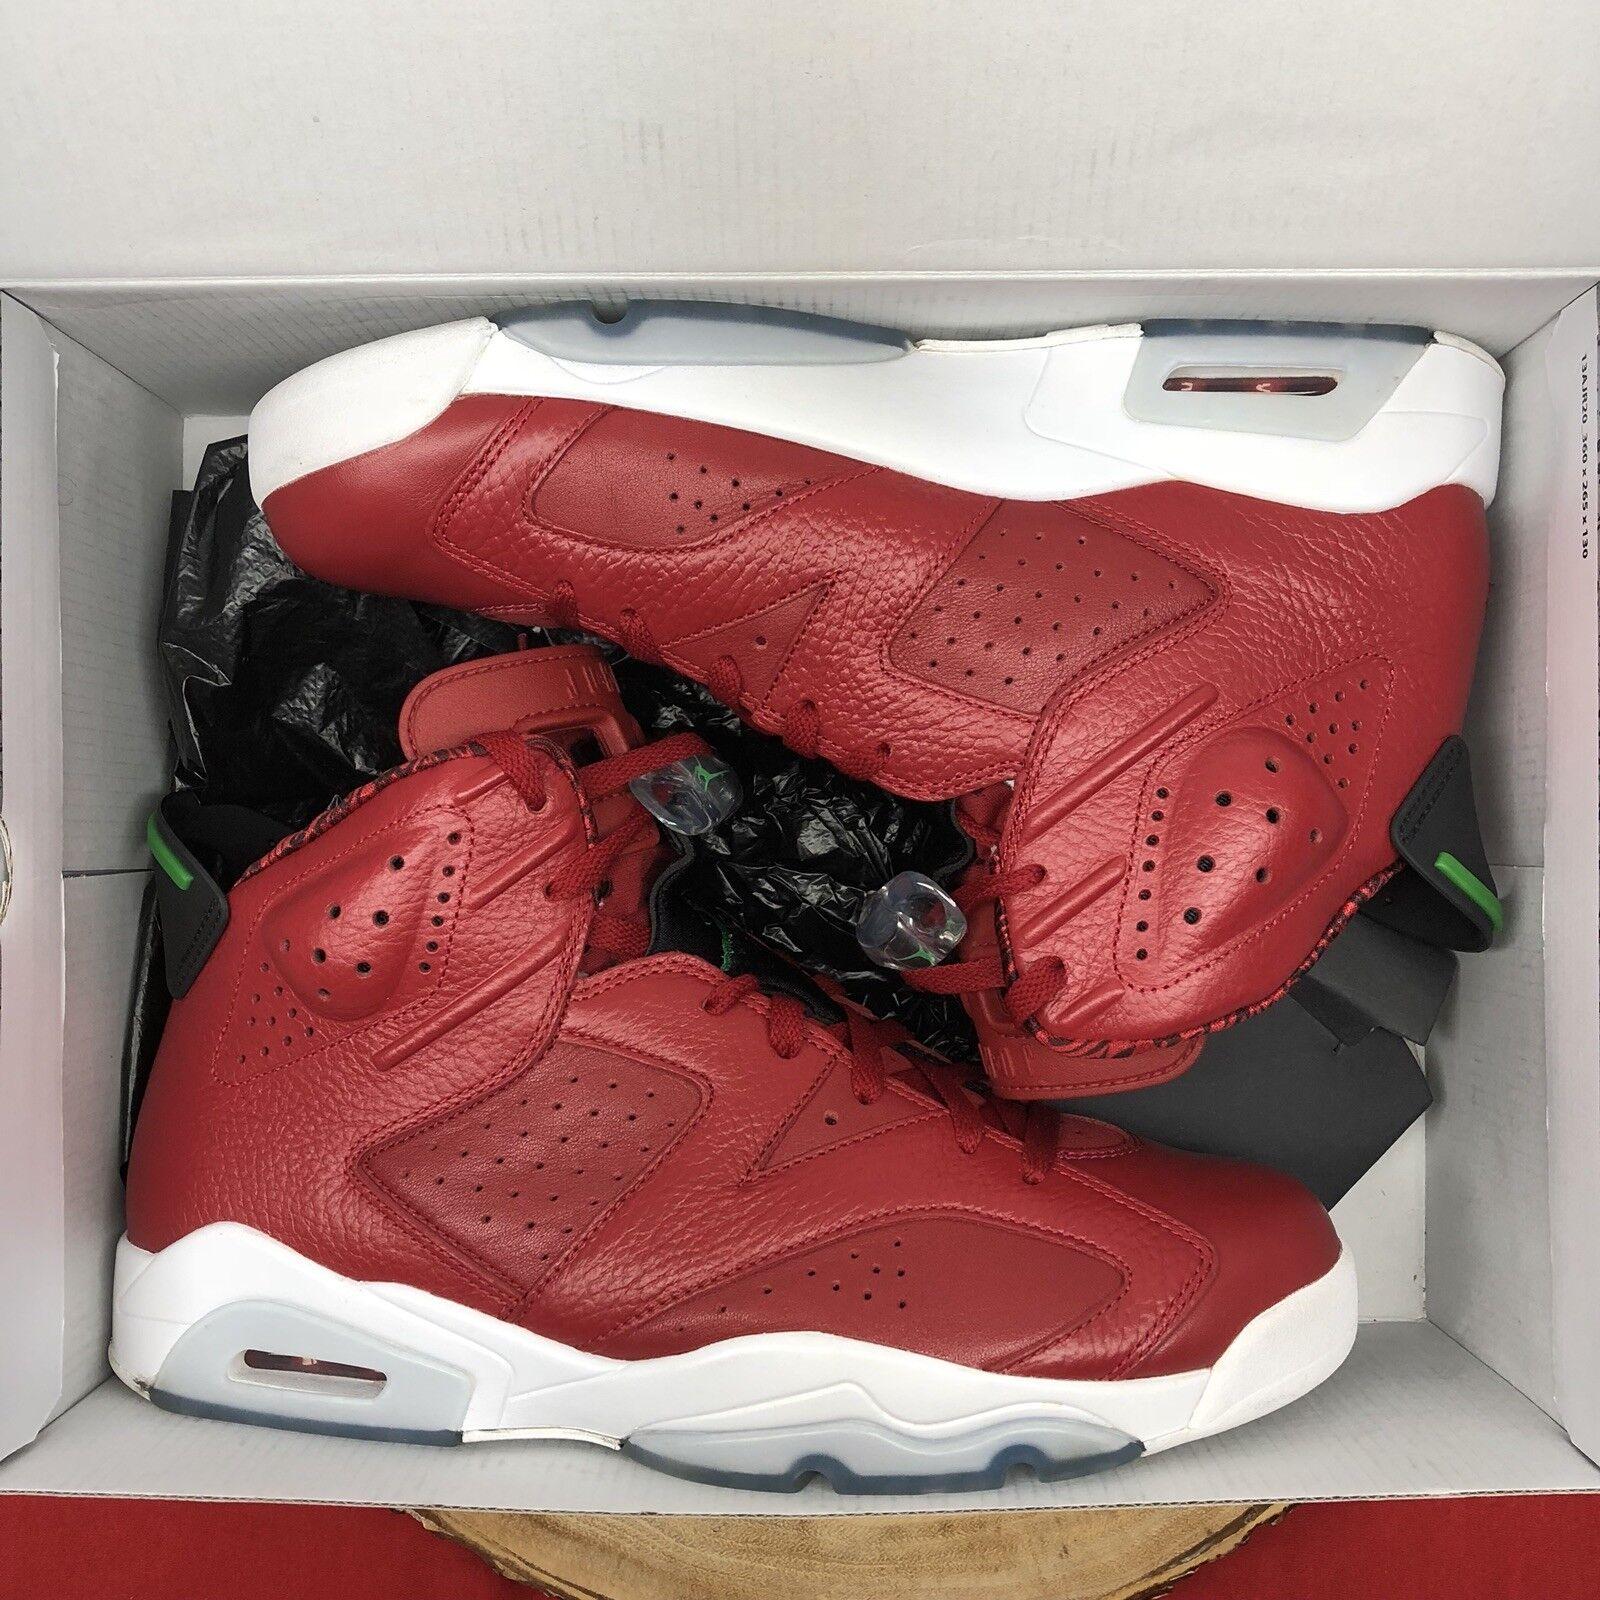 Nike Air Jordan Retro VI Spizike History Of Flight Red October SZ 12 694091 625